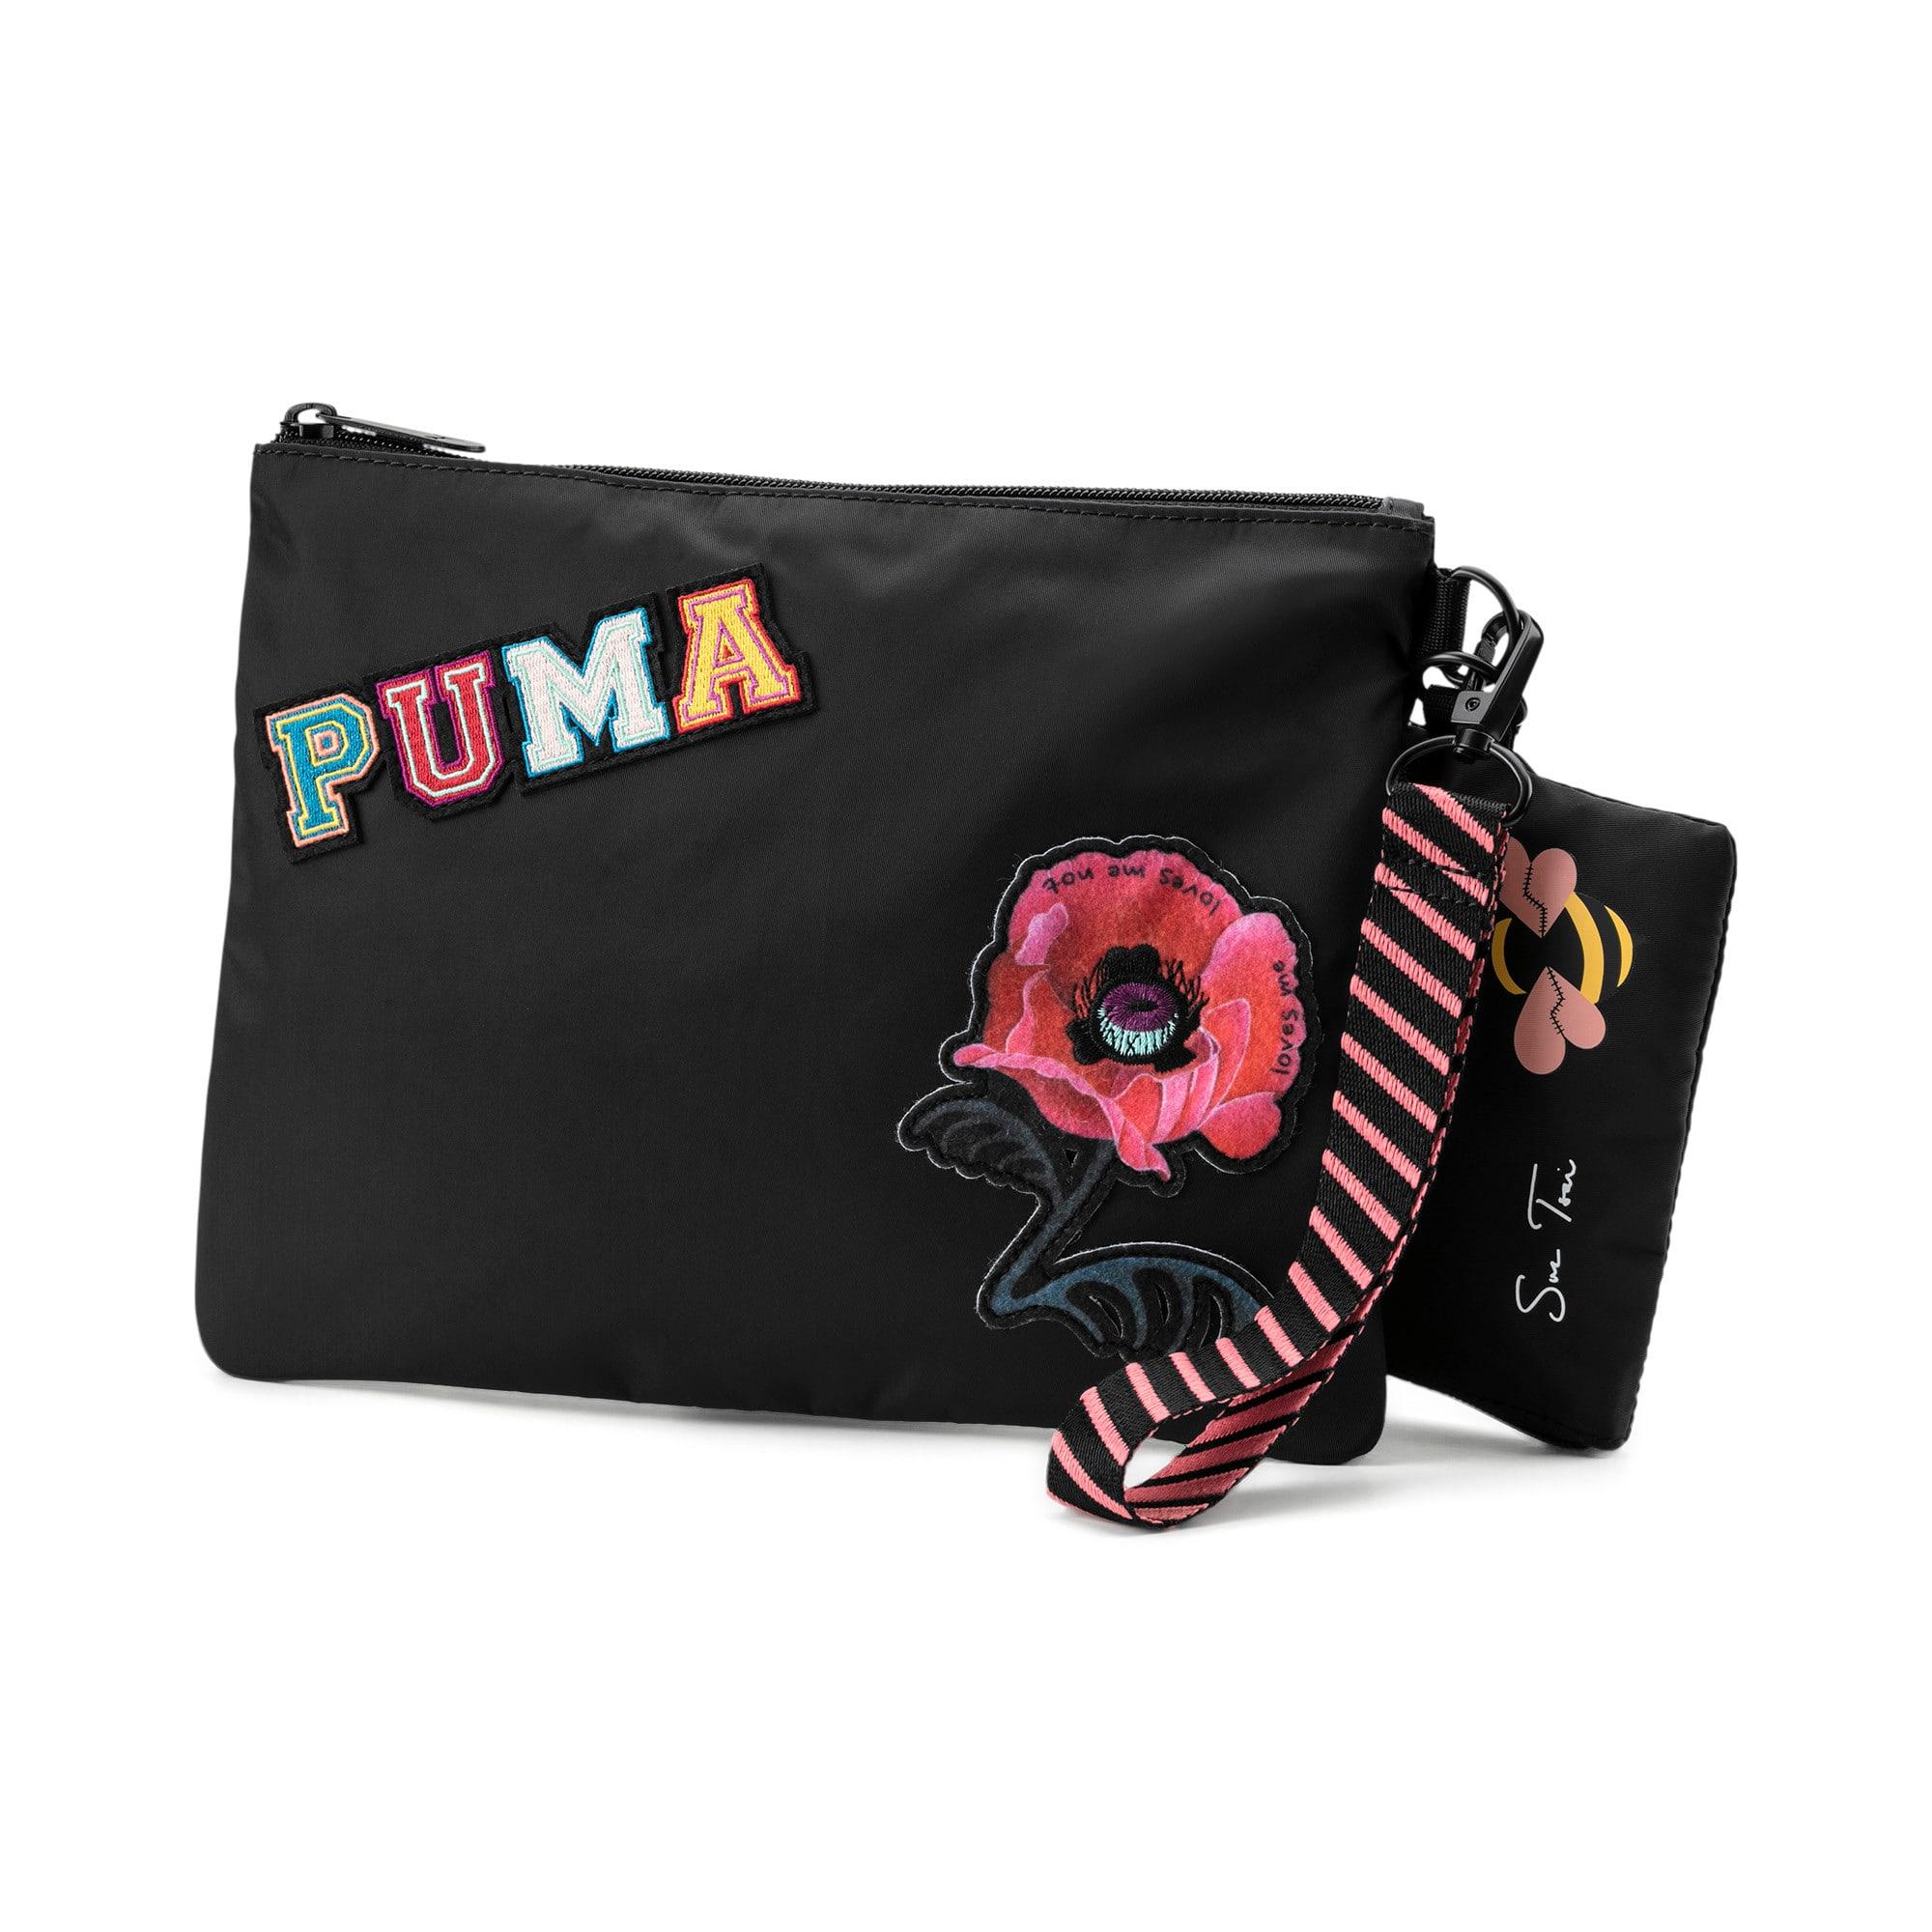 Thumbnail 1 of PUMA x SUE TSAI ウィメンズ ポーチ 1.5L, Puma Black, medium-JPN